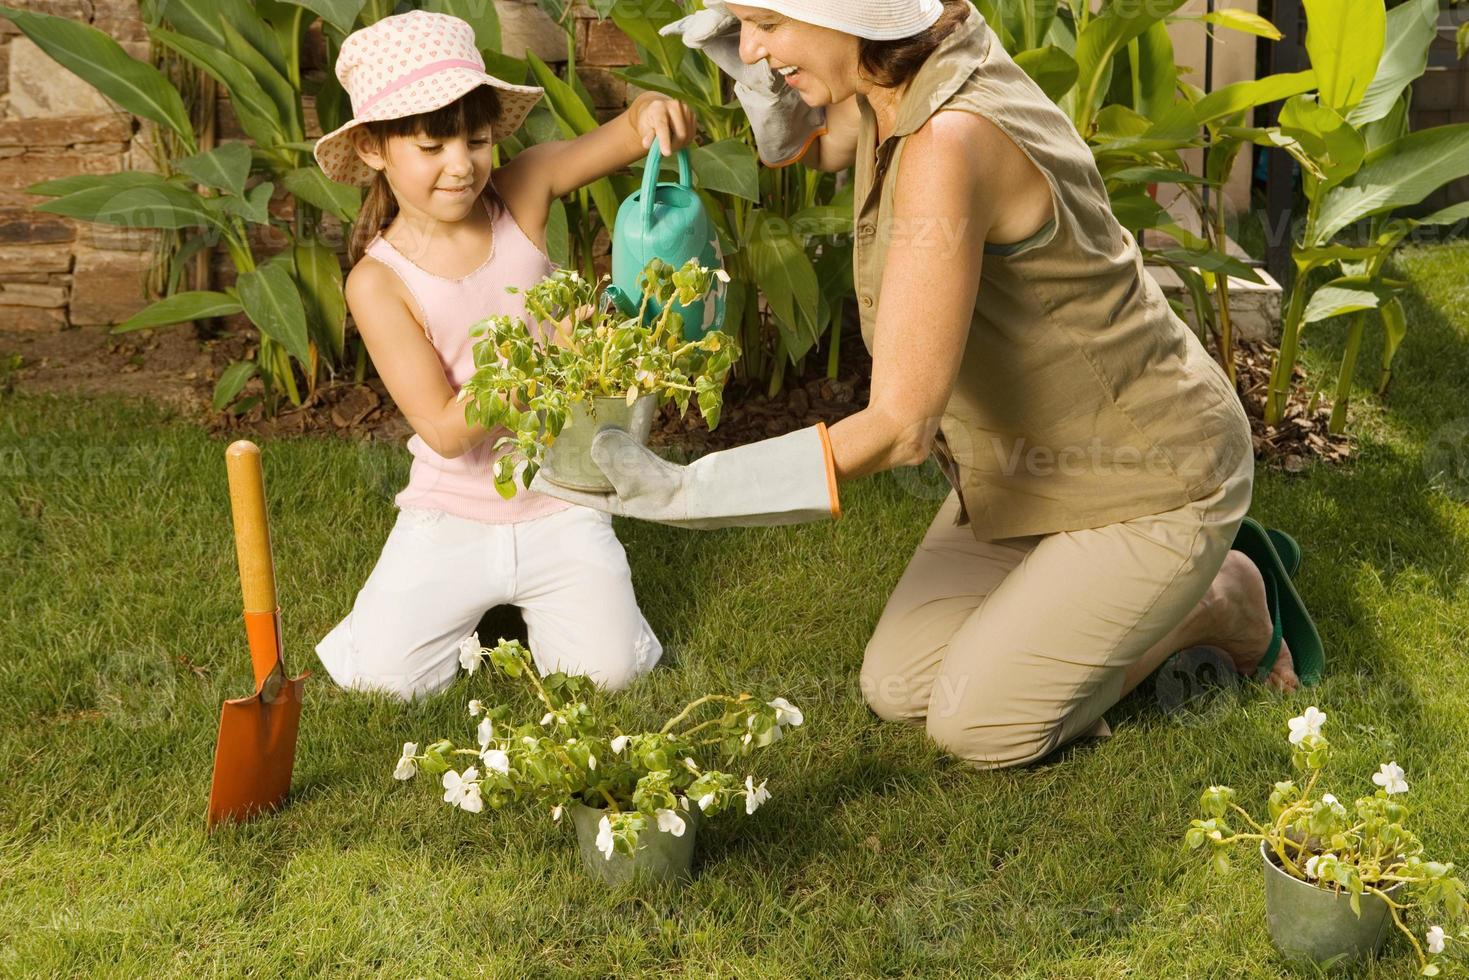 Girl and grandmother gardening photo